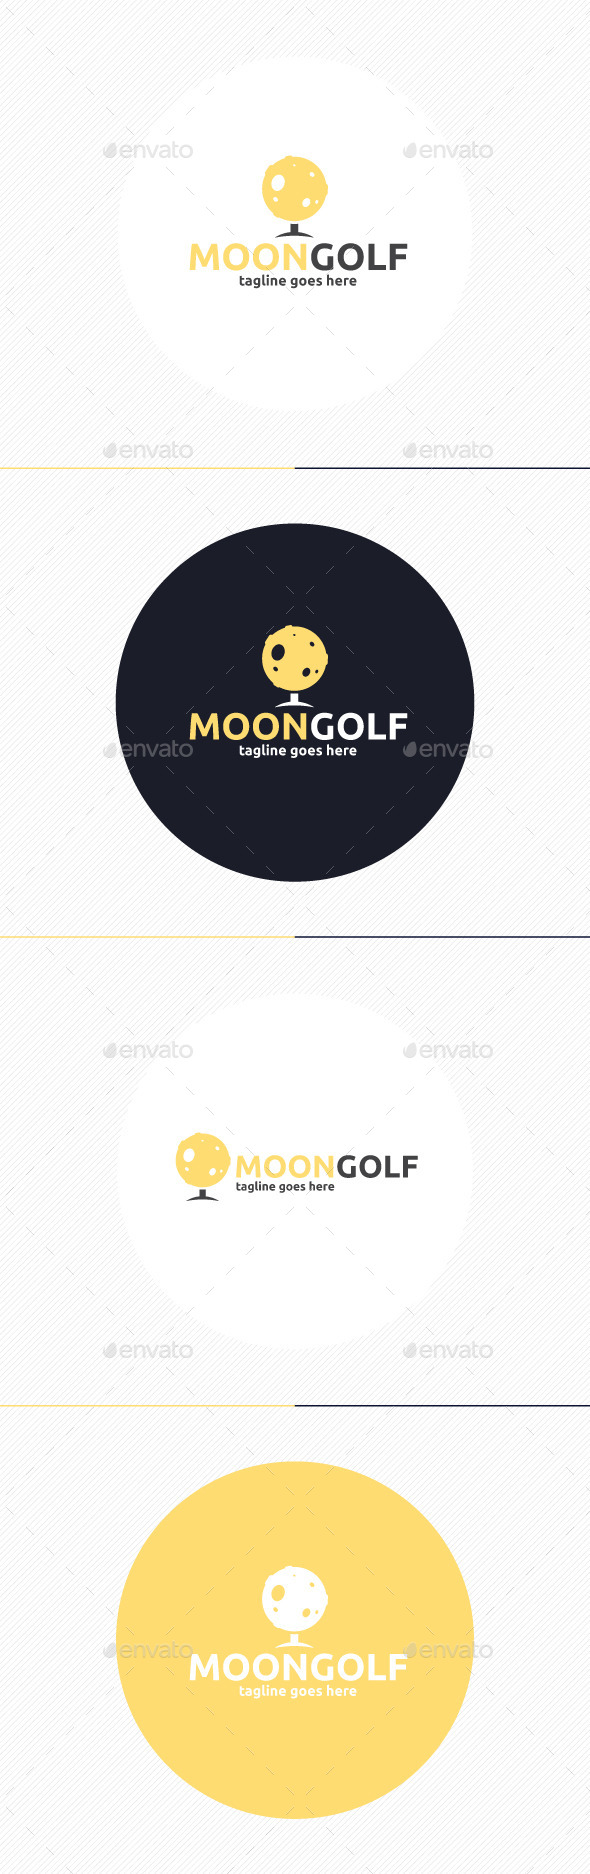 GraphicRiver Moon Golf Logo 9803031